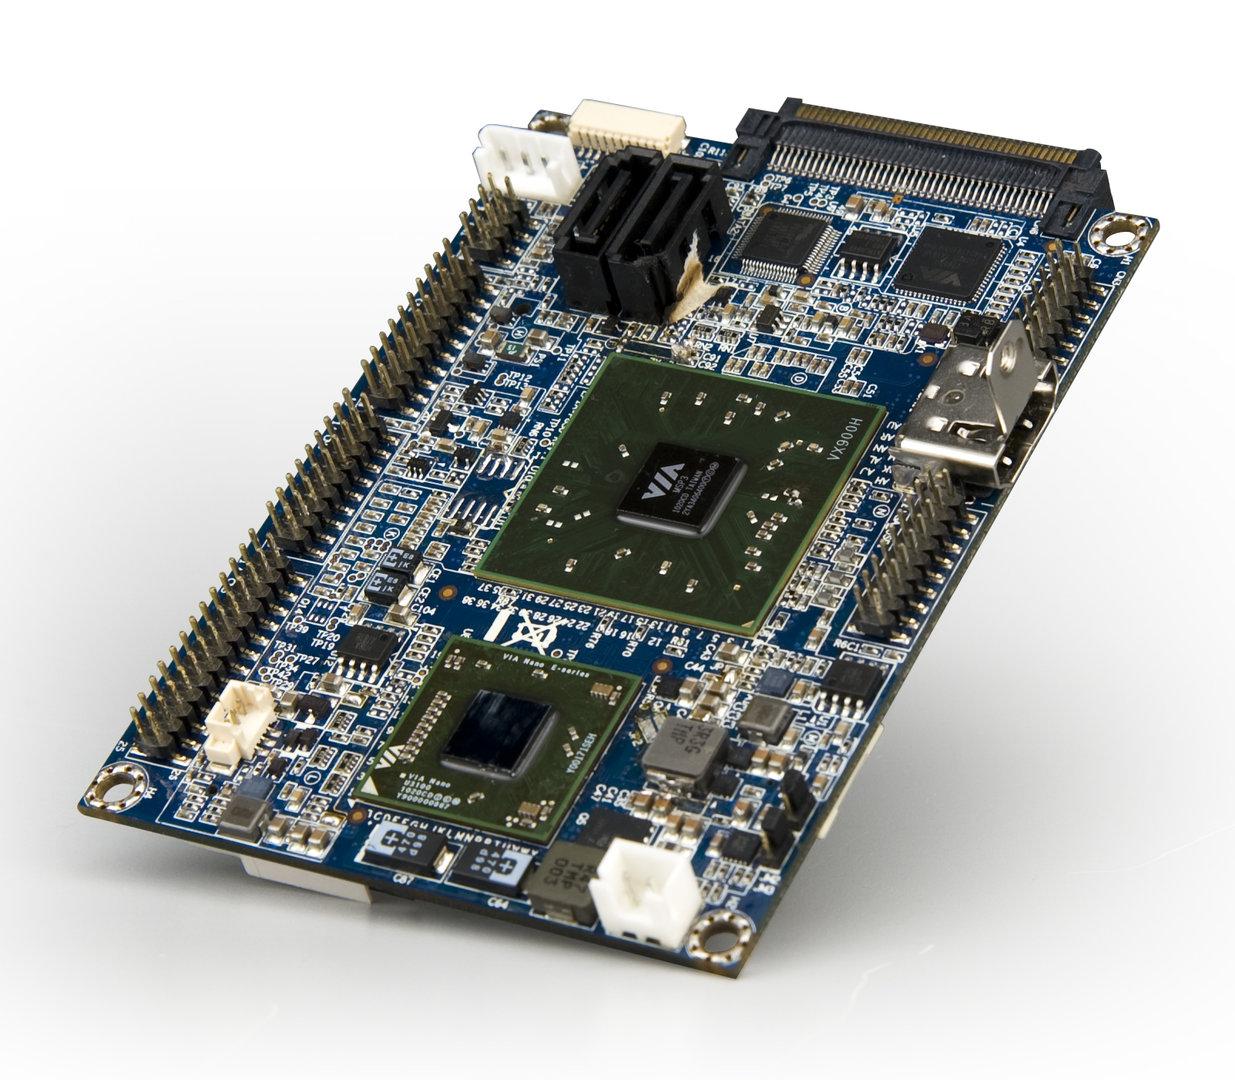 VIA EPIA-P830 Pico-ITX